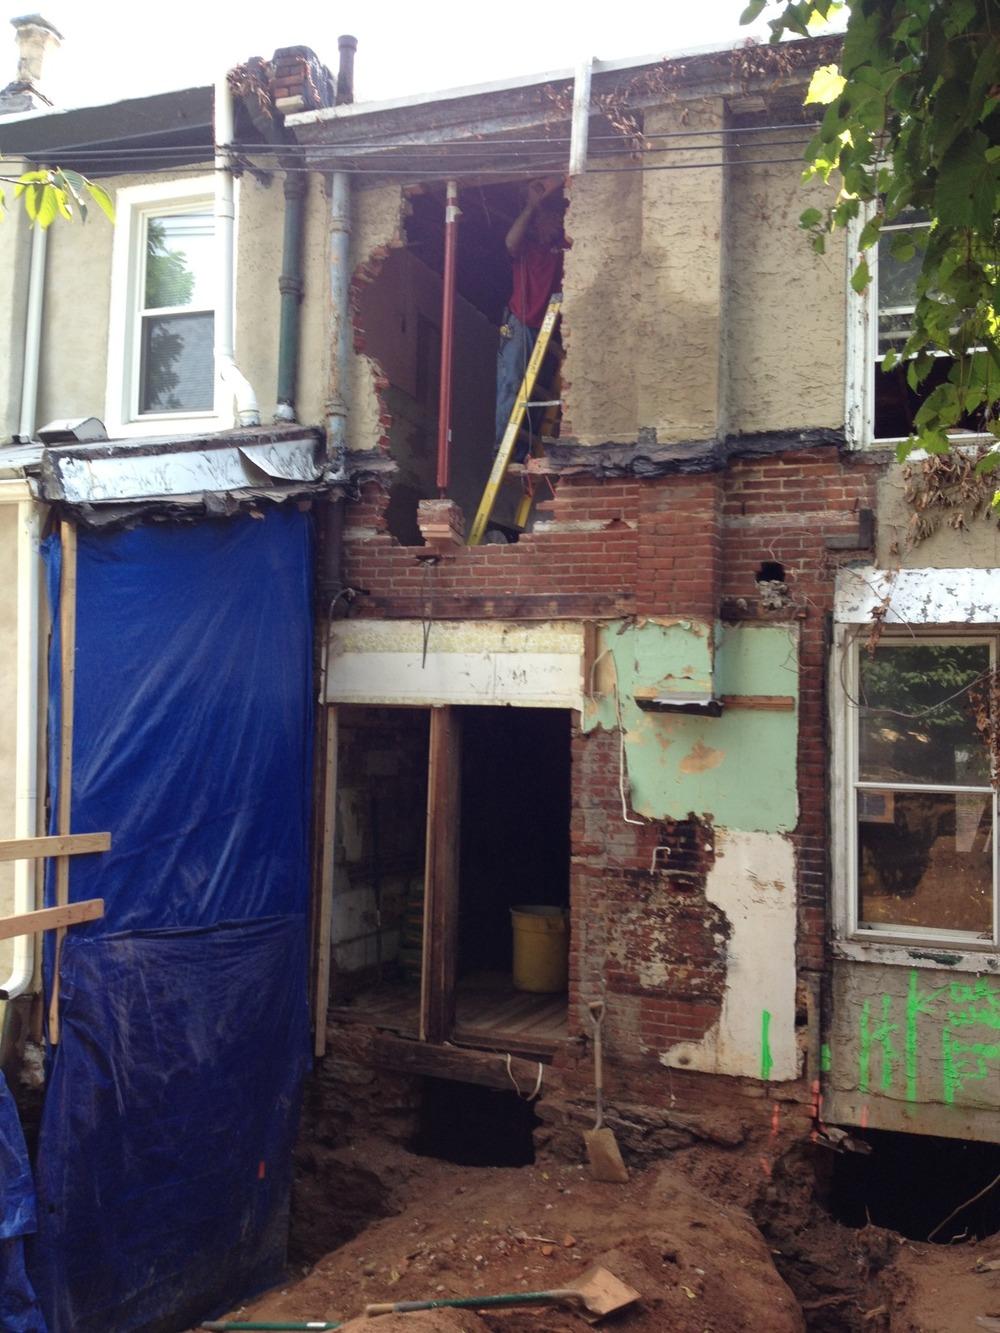 b - 3523 sunnyside demo kitchen 2.jpg